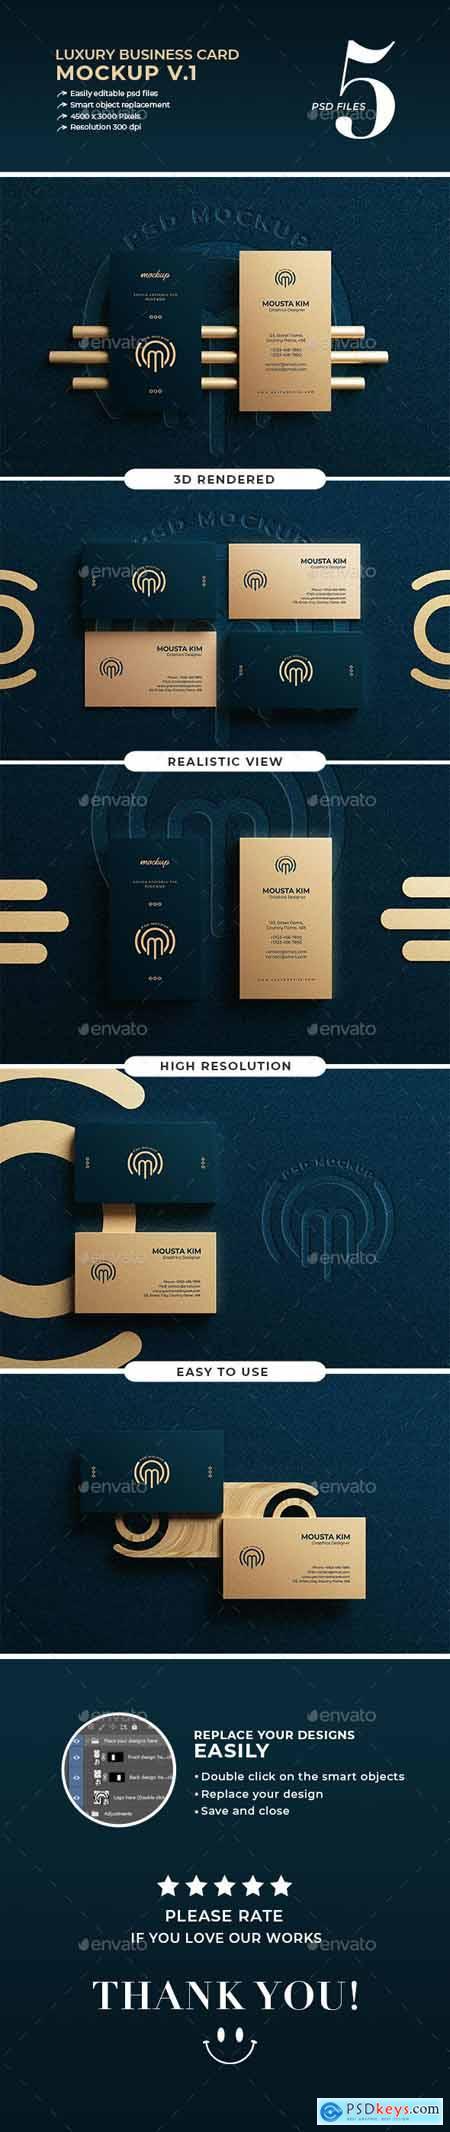 Luxury business card mockup v.1 30089626